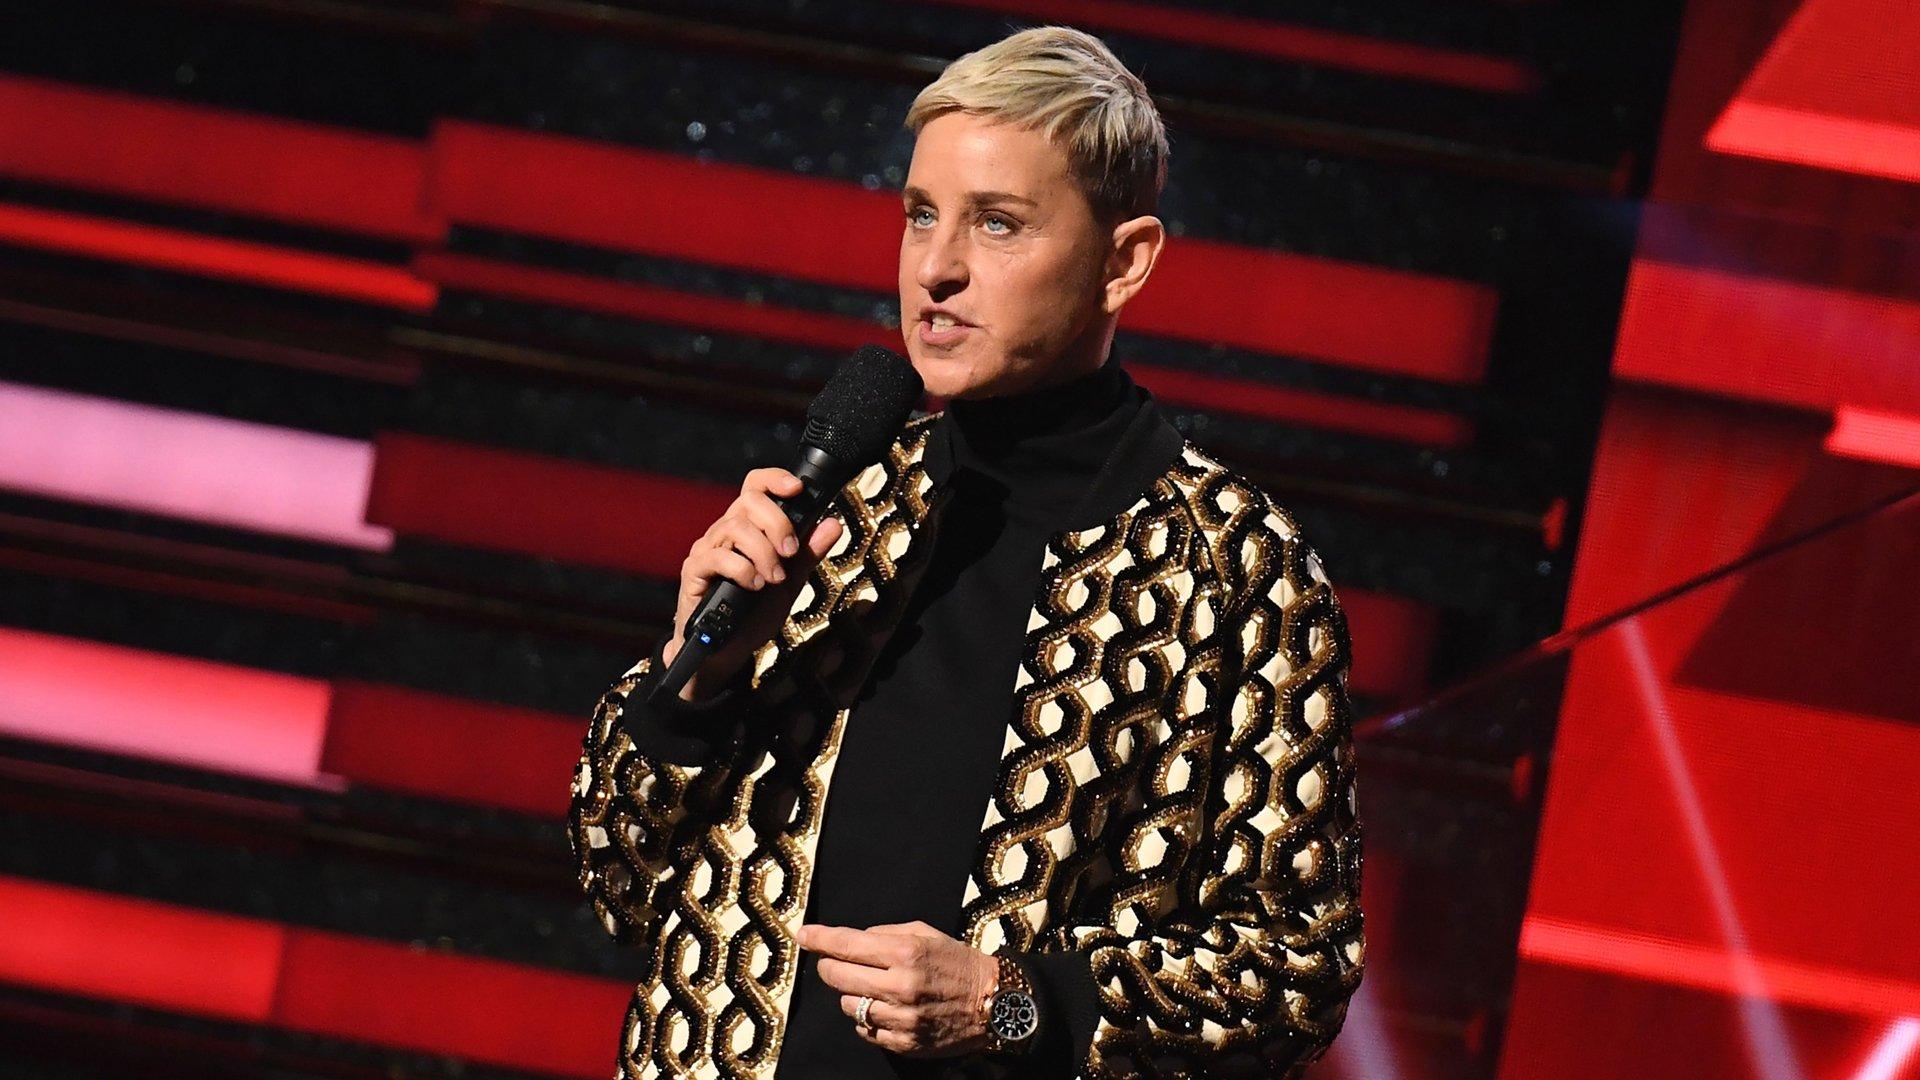 Ellen DeGeneres speaks during the 62nd Annual Grammy Awards on Jan. 26, 2020, in Los Angeles. (Credit: Robyn Beck/AFP via Getty Images)